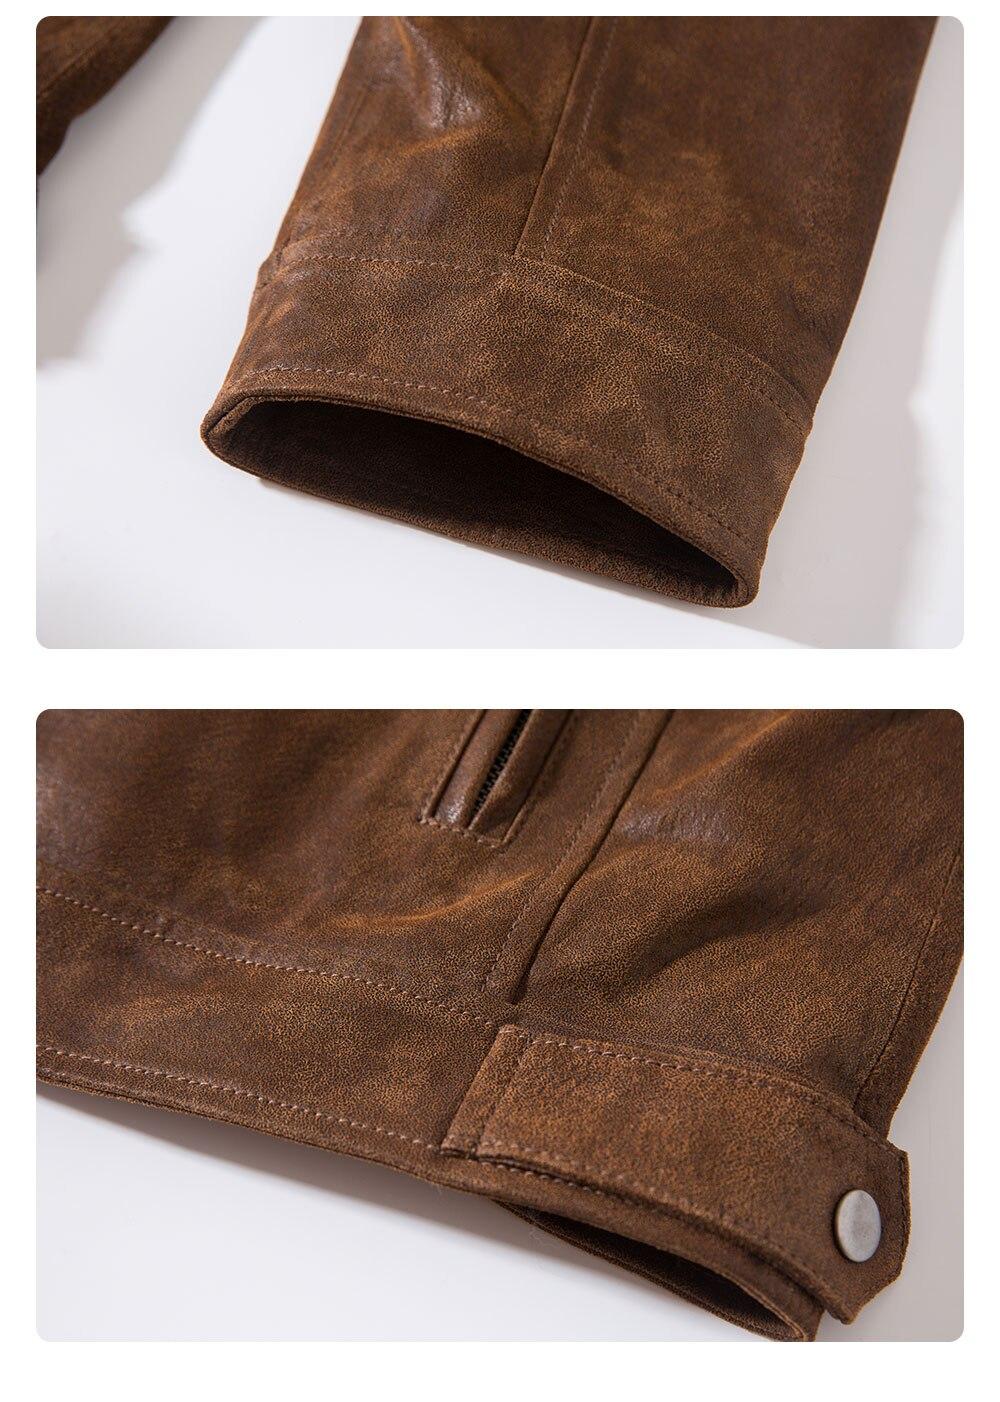 H4f2402d4d7394a749dfad688daf36f96m Men's Pigskin Real Leather Jacket Motorcycle Jacket Coat Men